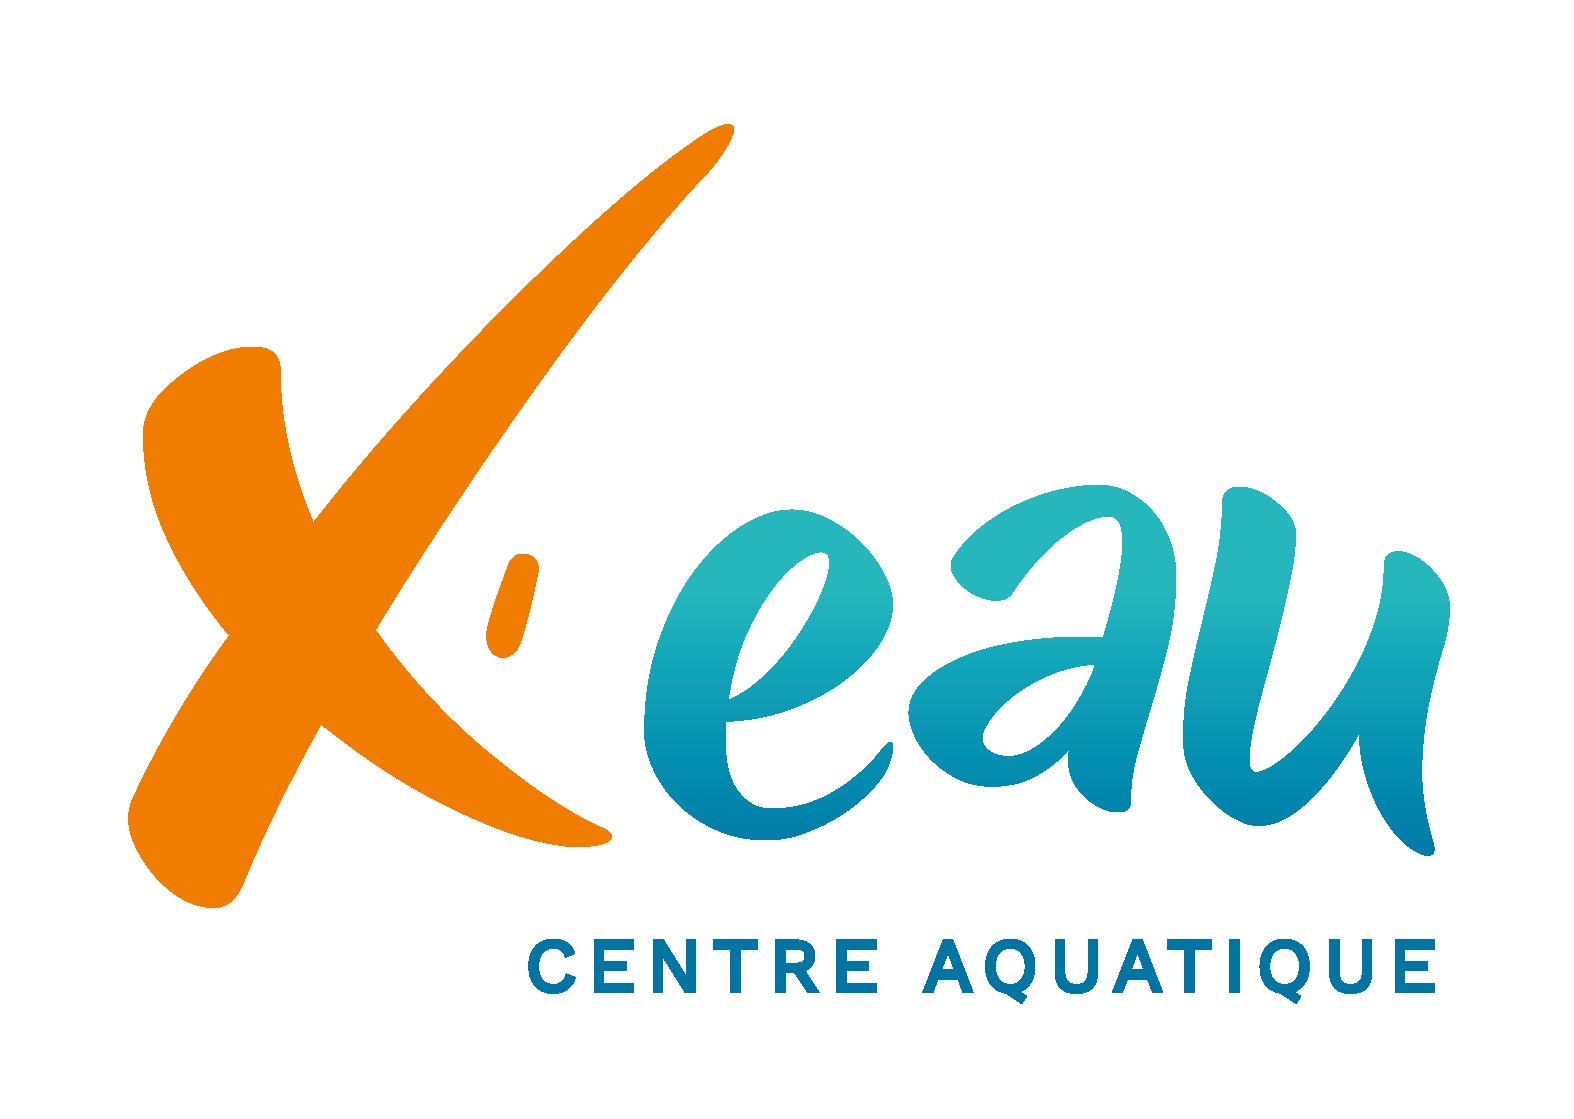 Centre Aquatique X Eau Piscine Cognac